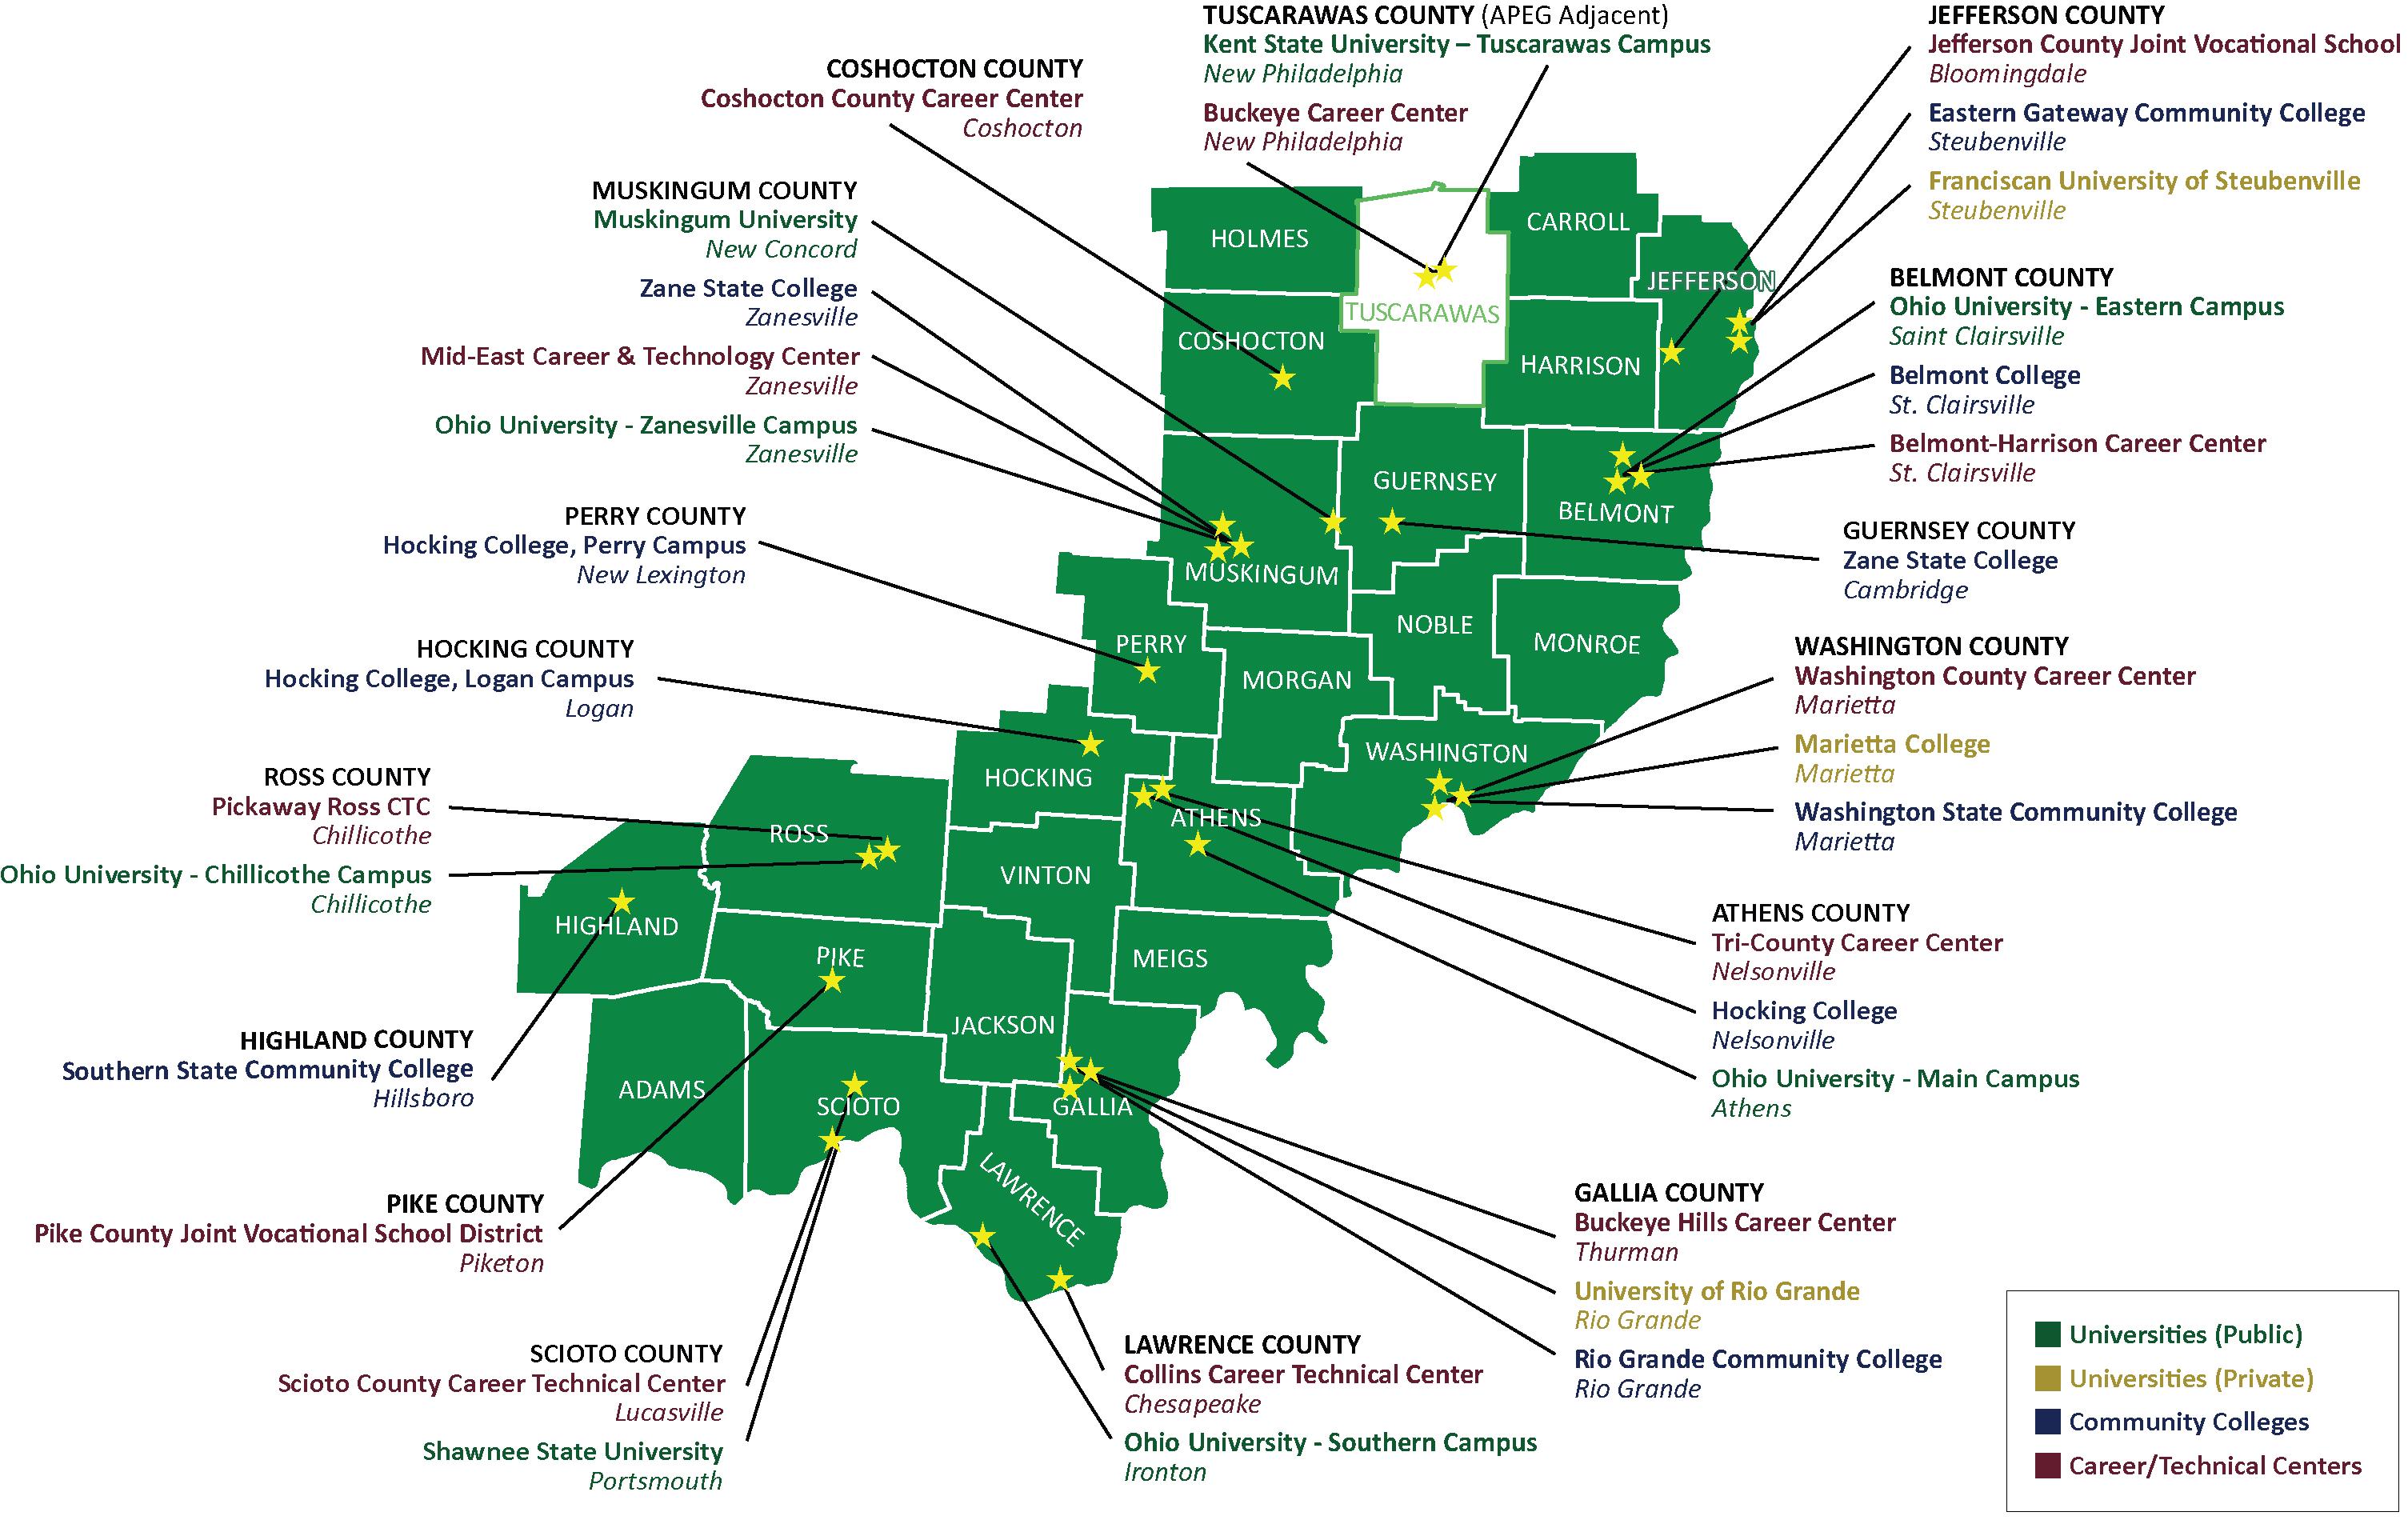 APEG Education - Philadelphia university map